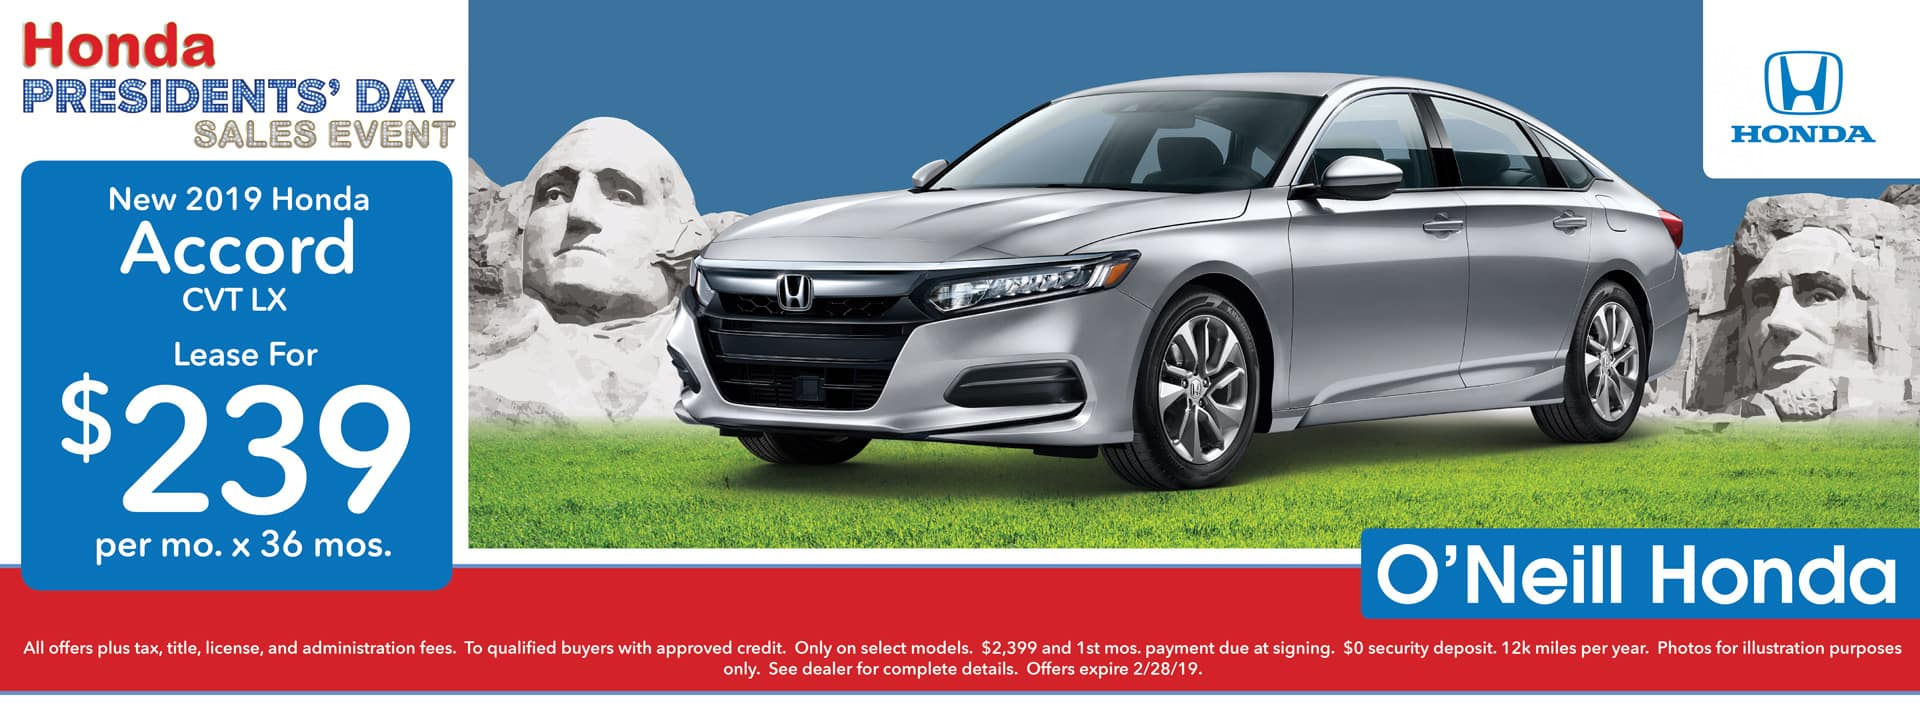 2018 Honda Accord Lease Offer